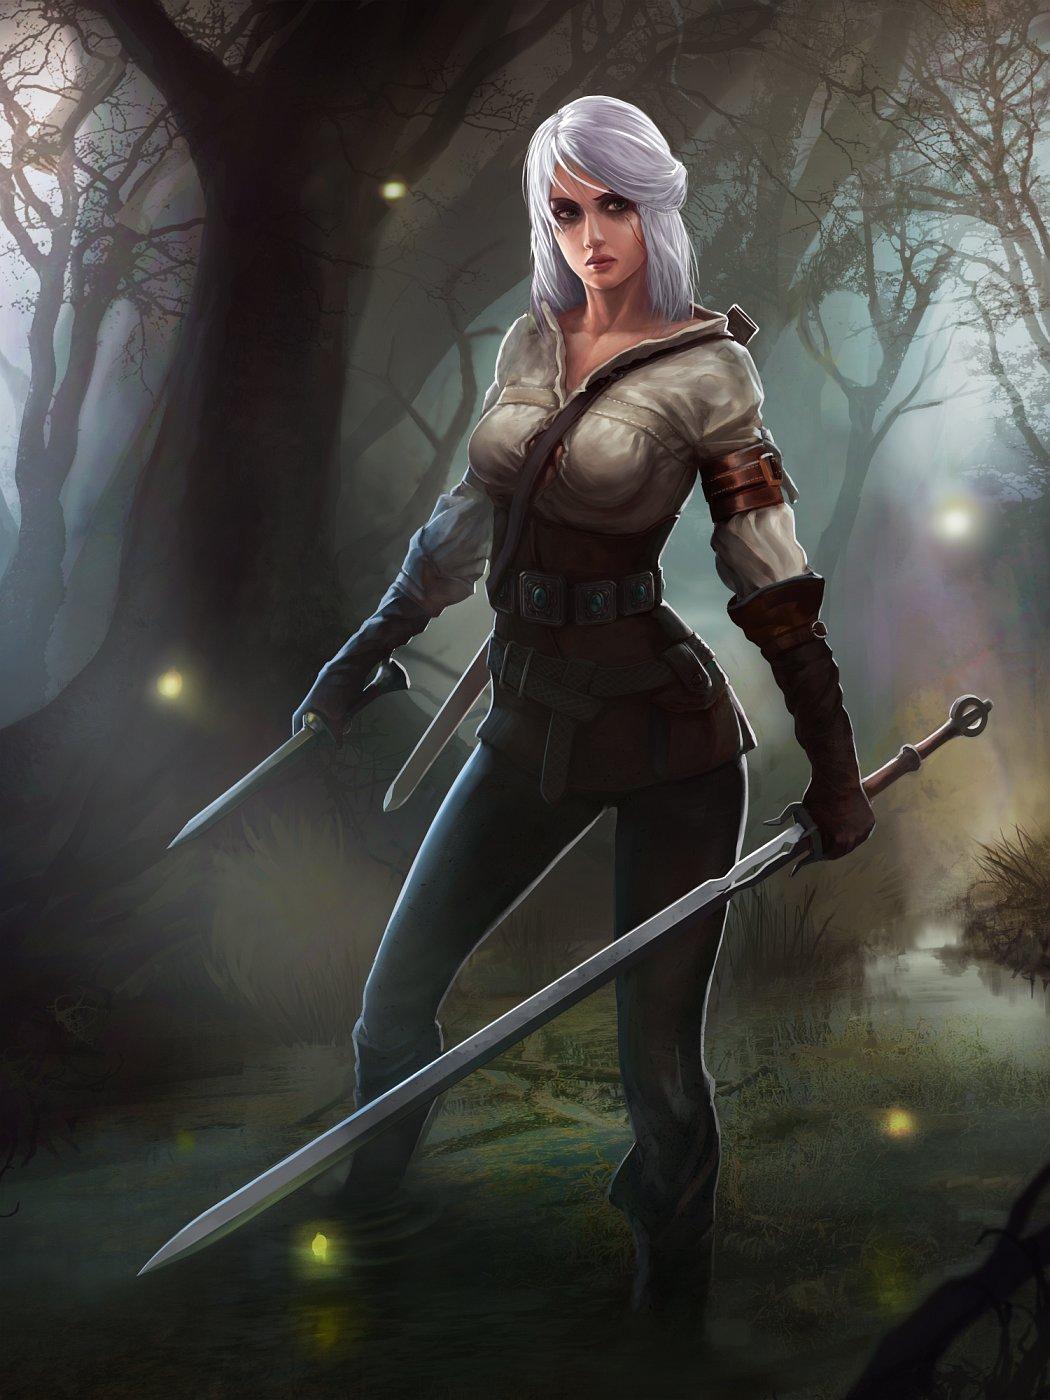 The Witcher 3 concept art picture Cirilla Цири